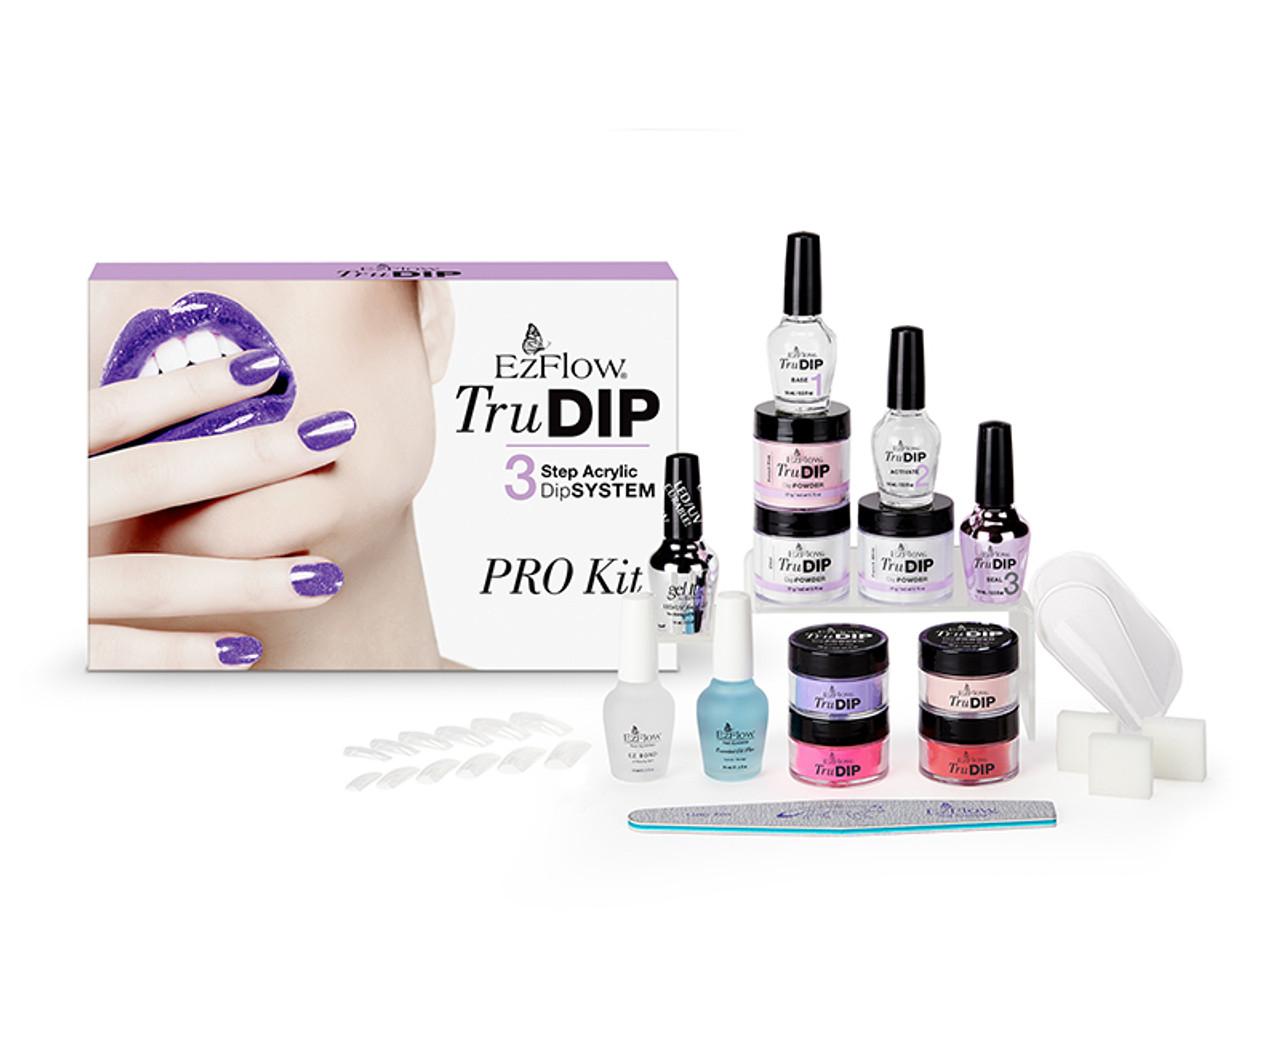 EZ Flow TruDIP Acrylic PRO Kit